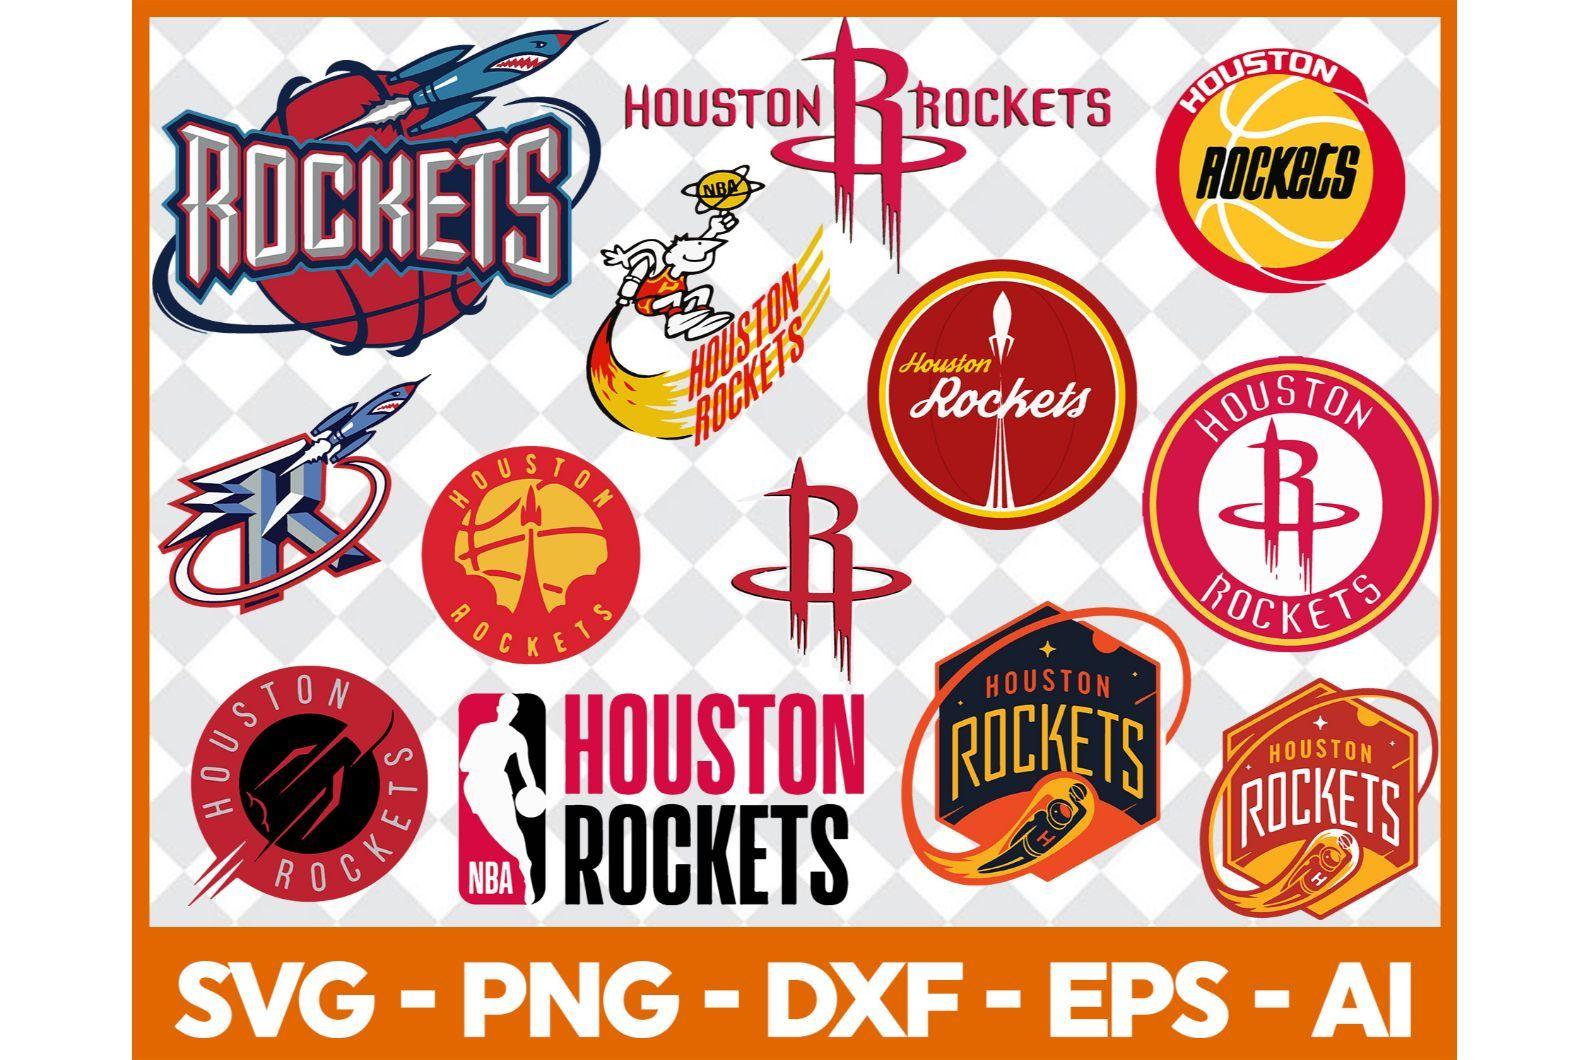 Houston Rockets Nba Svg Basketball Svg File Basketball Logo Nba Fabric Nba Basketball Nba Svg Basket In 2020 Houston Rockets Rockets Logo Houston Rockets Basketball